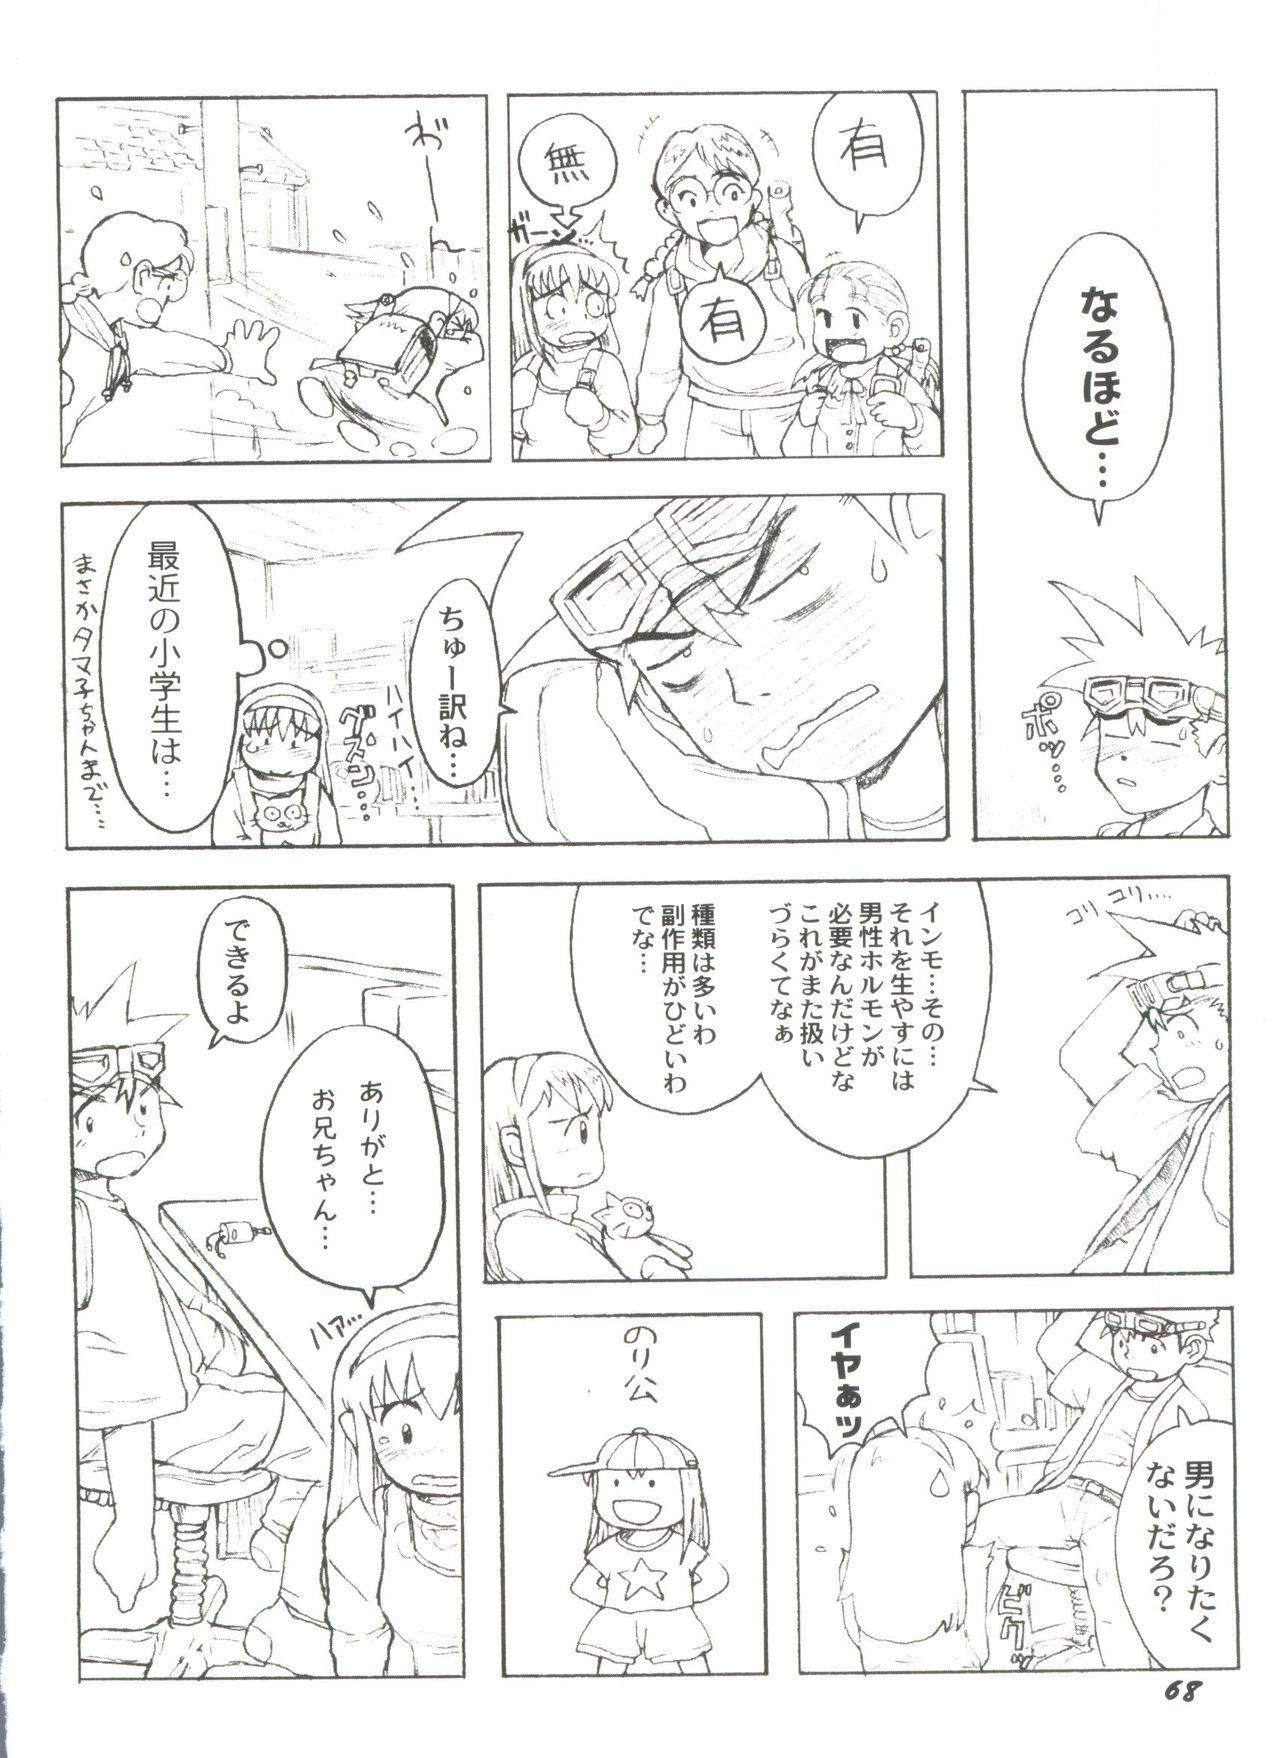 [Anthology] Denei Tamatebako 8 - Utakata no Tenshi-tachi II (Various) 69